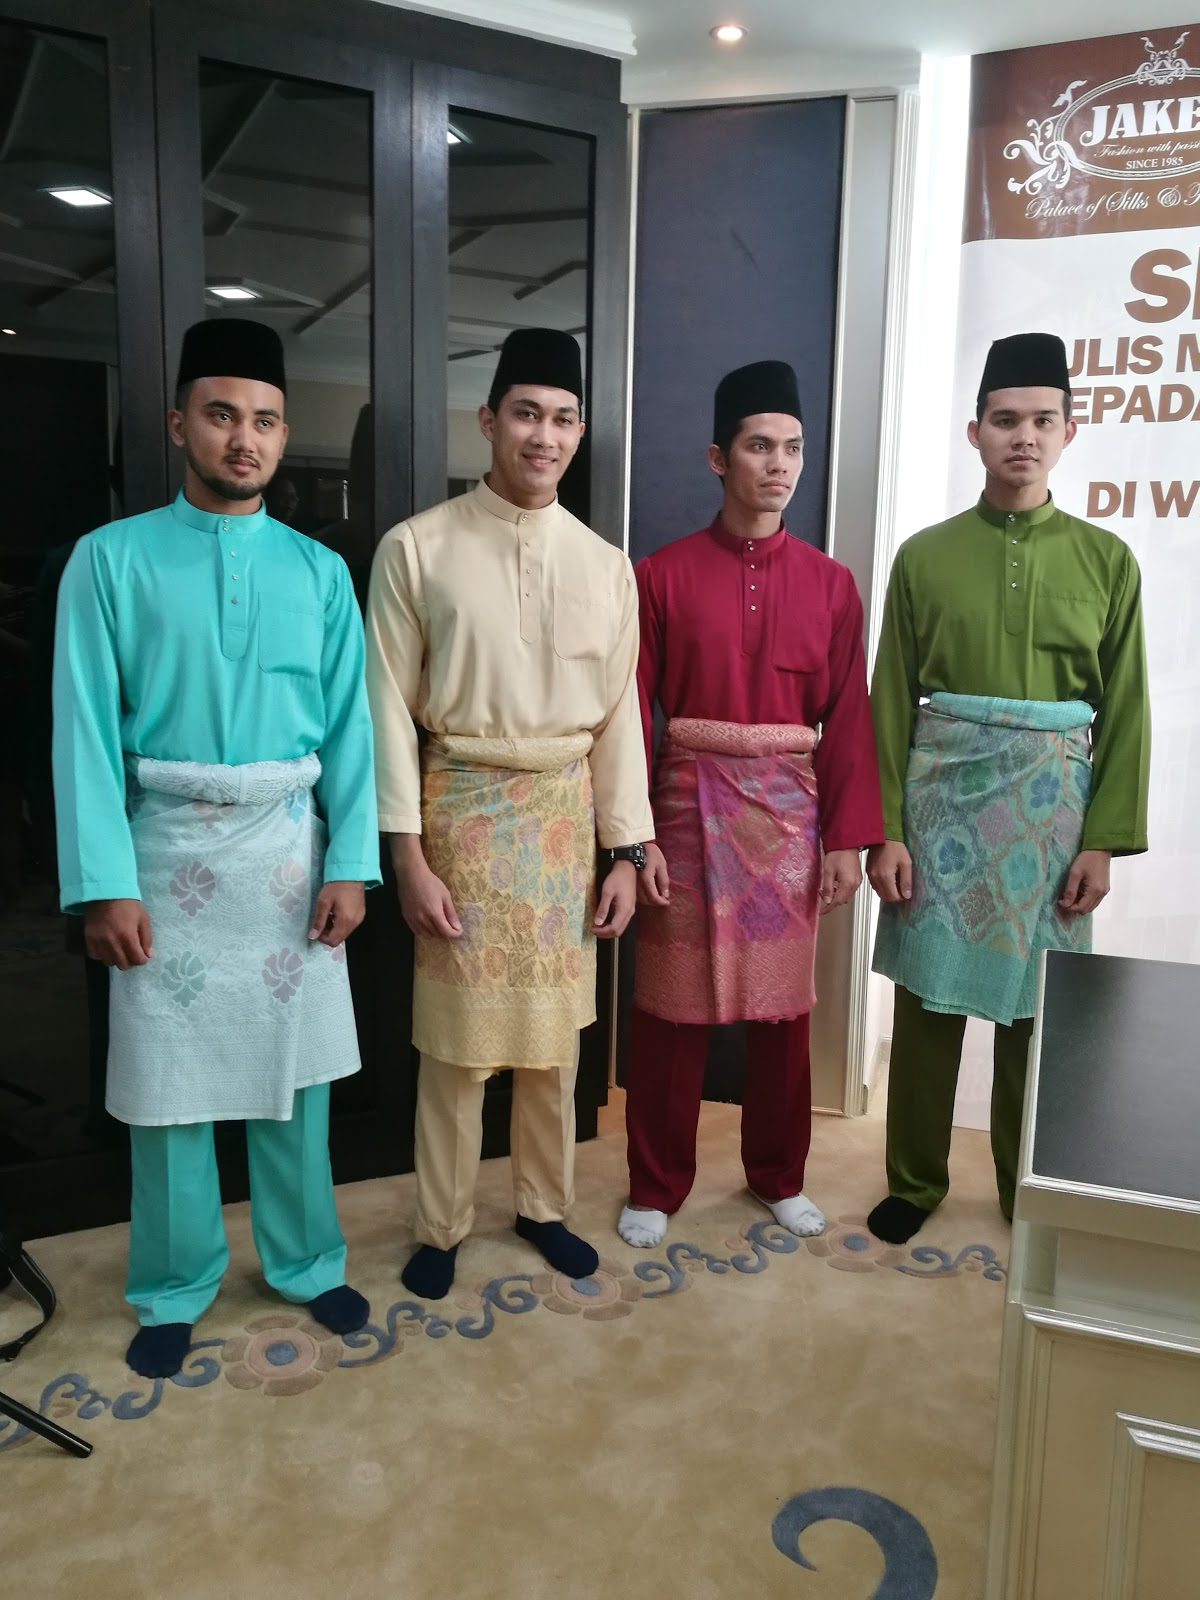 YB Dato' Hj Ikmal Hisham Abd Aziz Contribute 60,000 pcs of Jakel Baju Raya 2